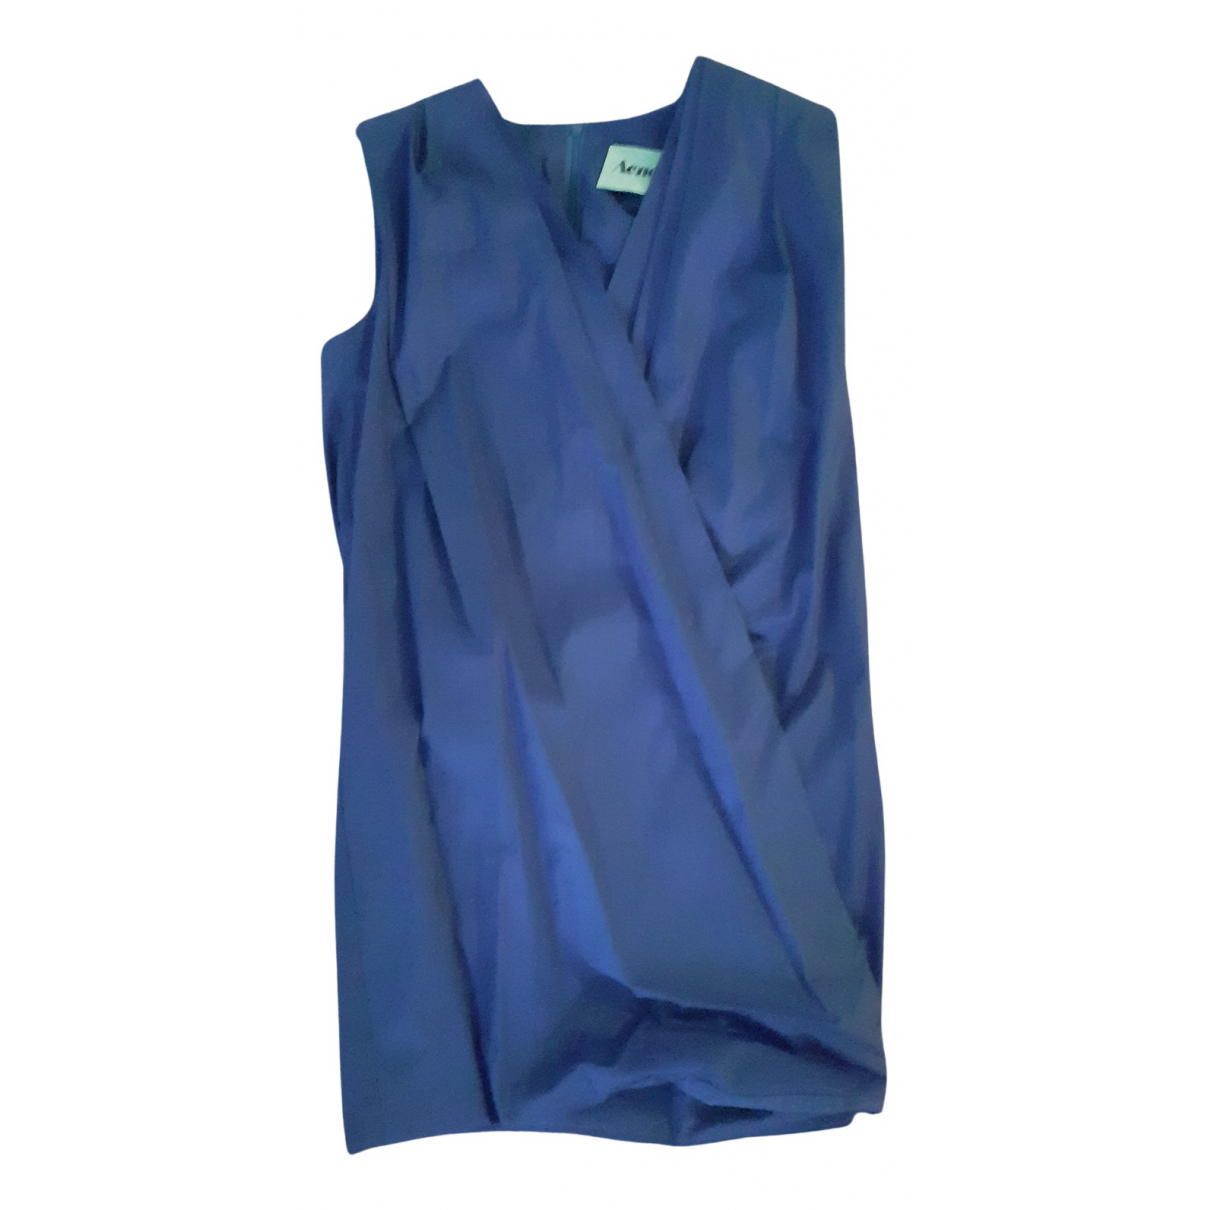 Acne Studios N Blue Cotton dress for Women 34 FR